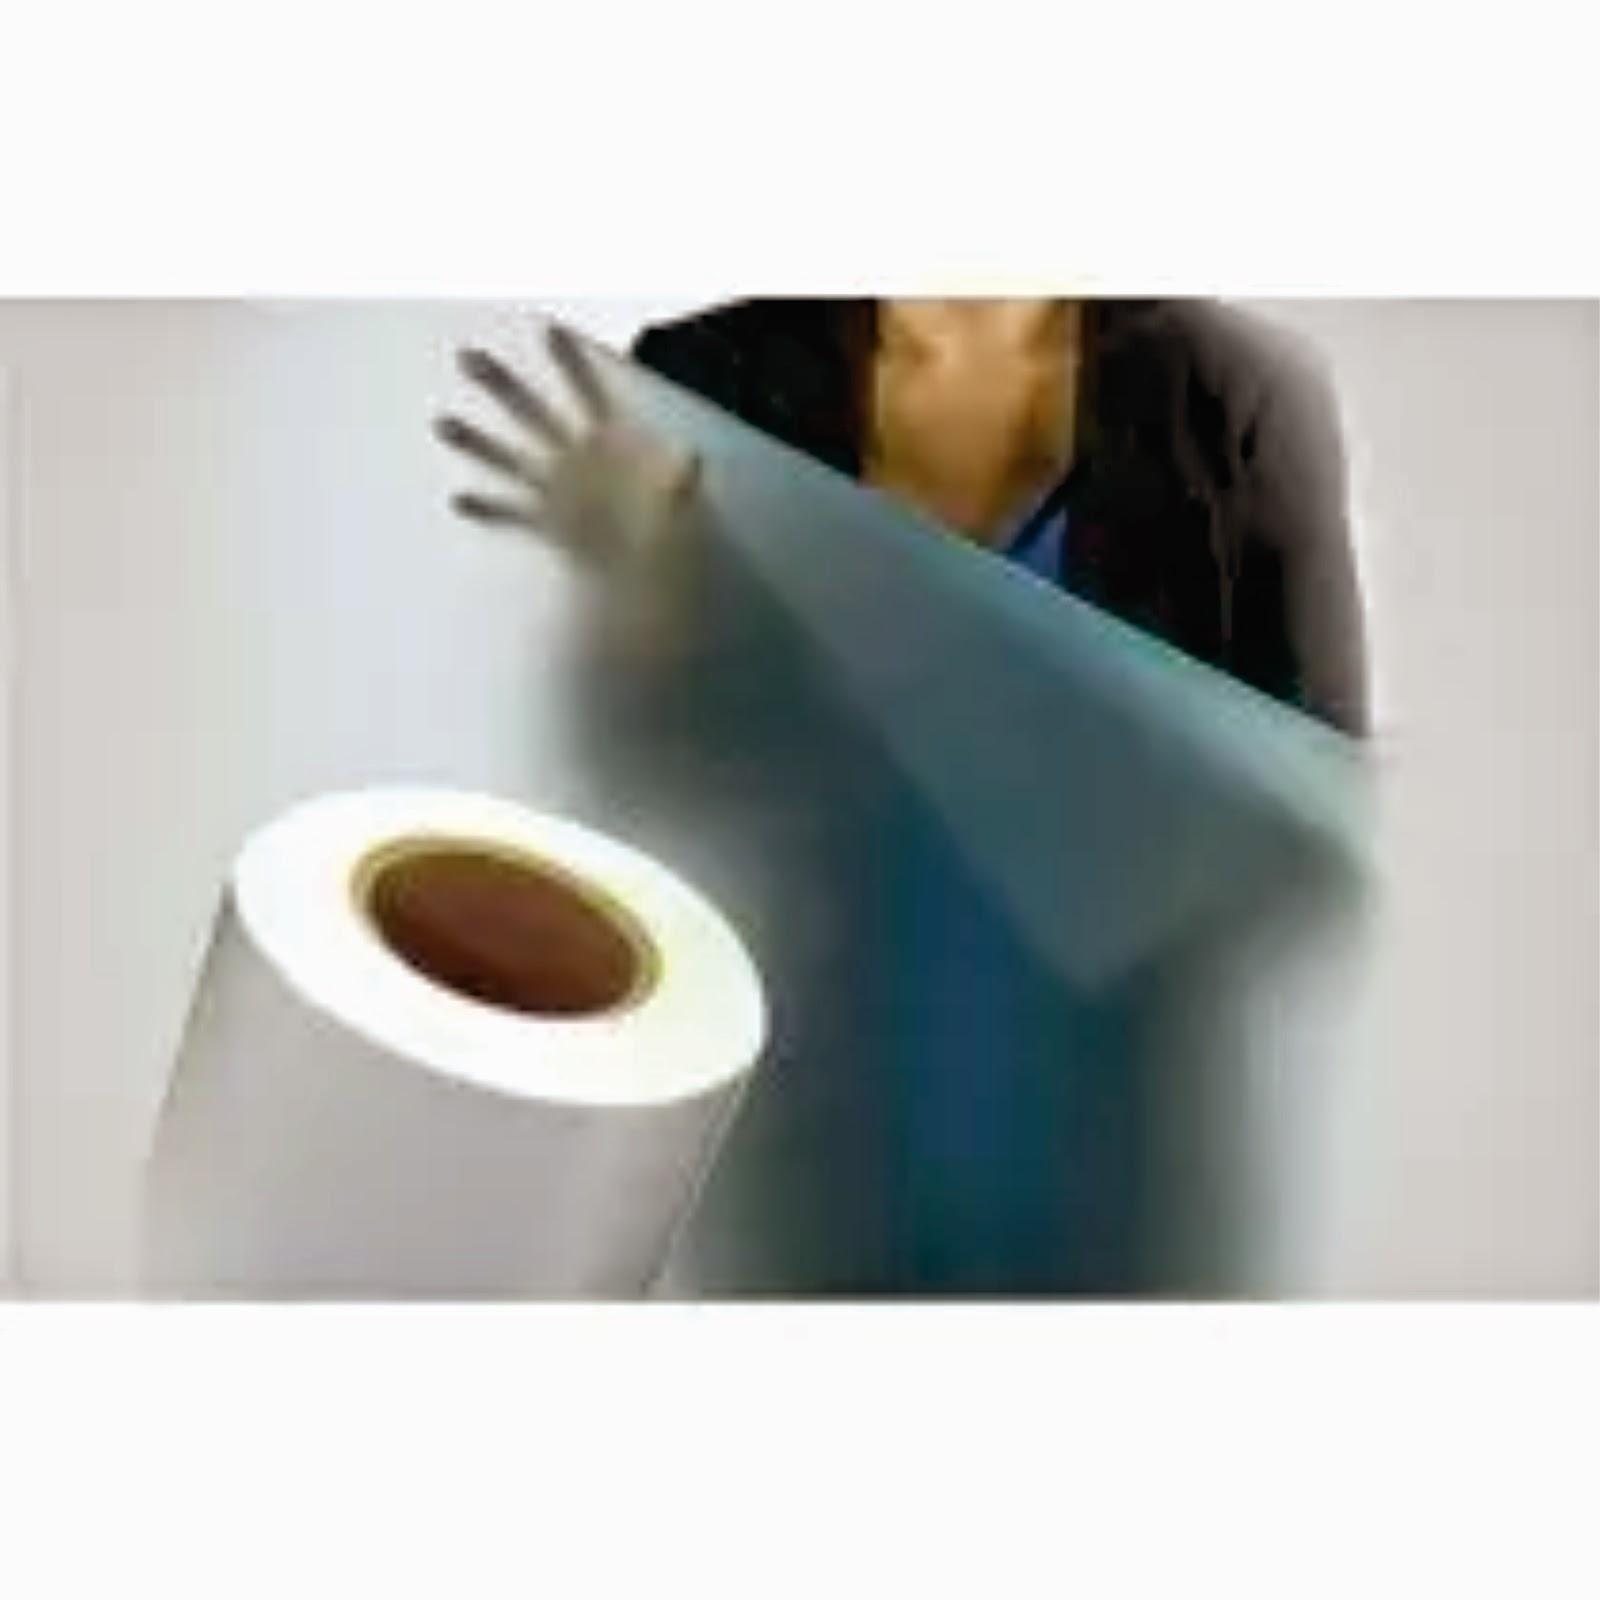 GARAGE 75 ADESIVOS: Adesivo decorativo box banheiro/Jateado/ Bauru #664423 1600x1600 Adesivos Para Box De Vidro Banheiro